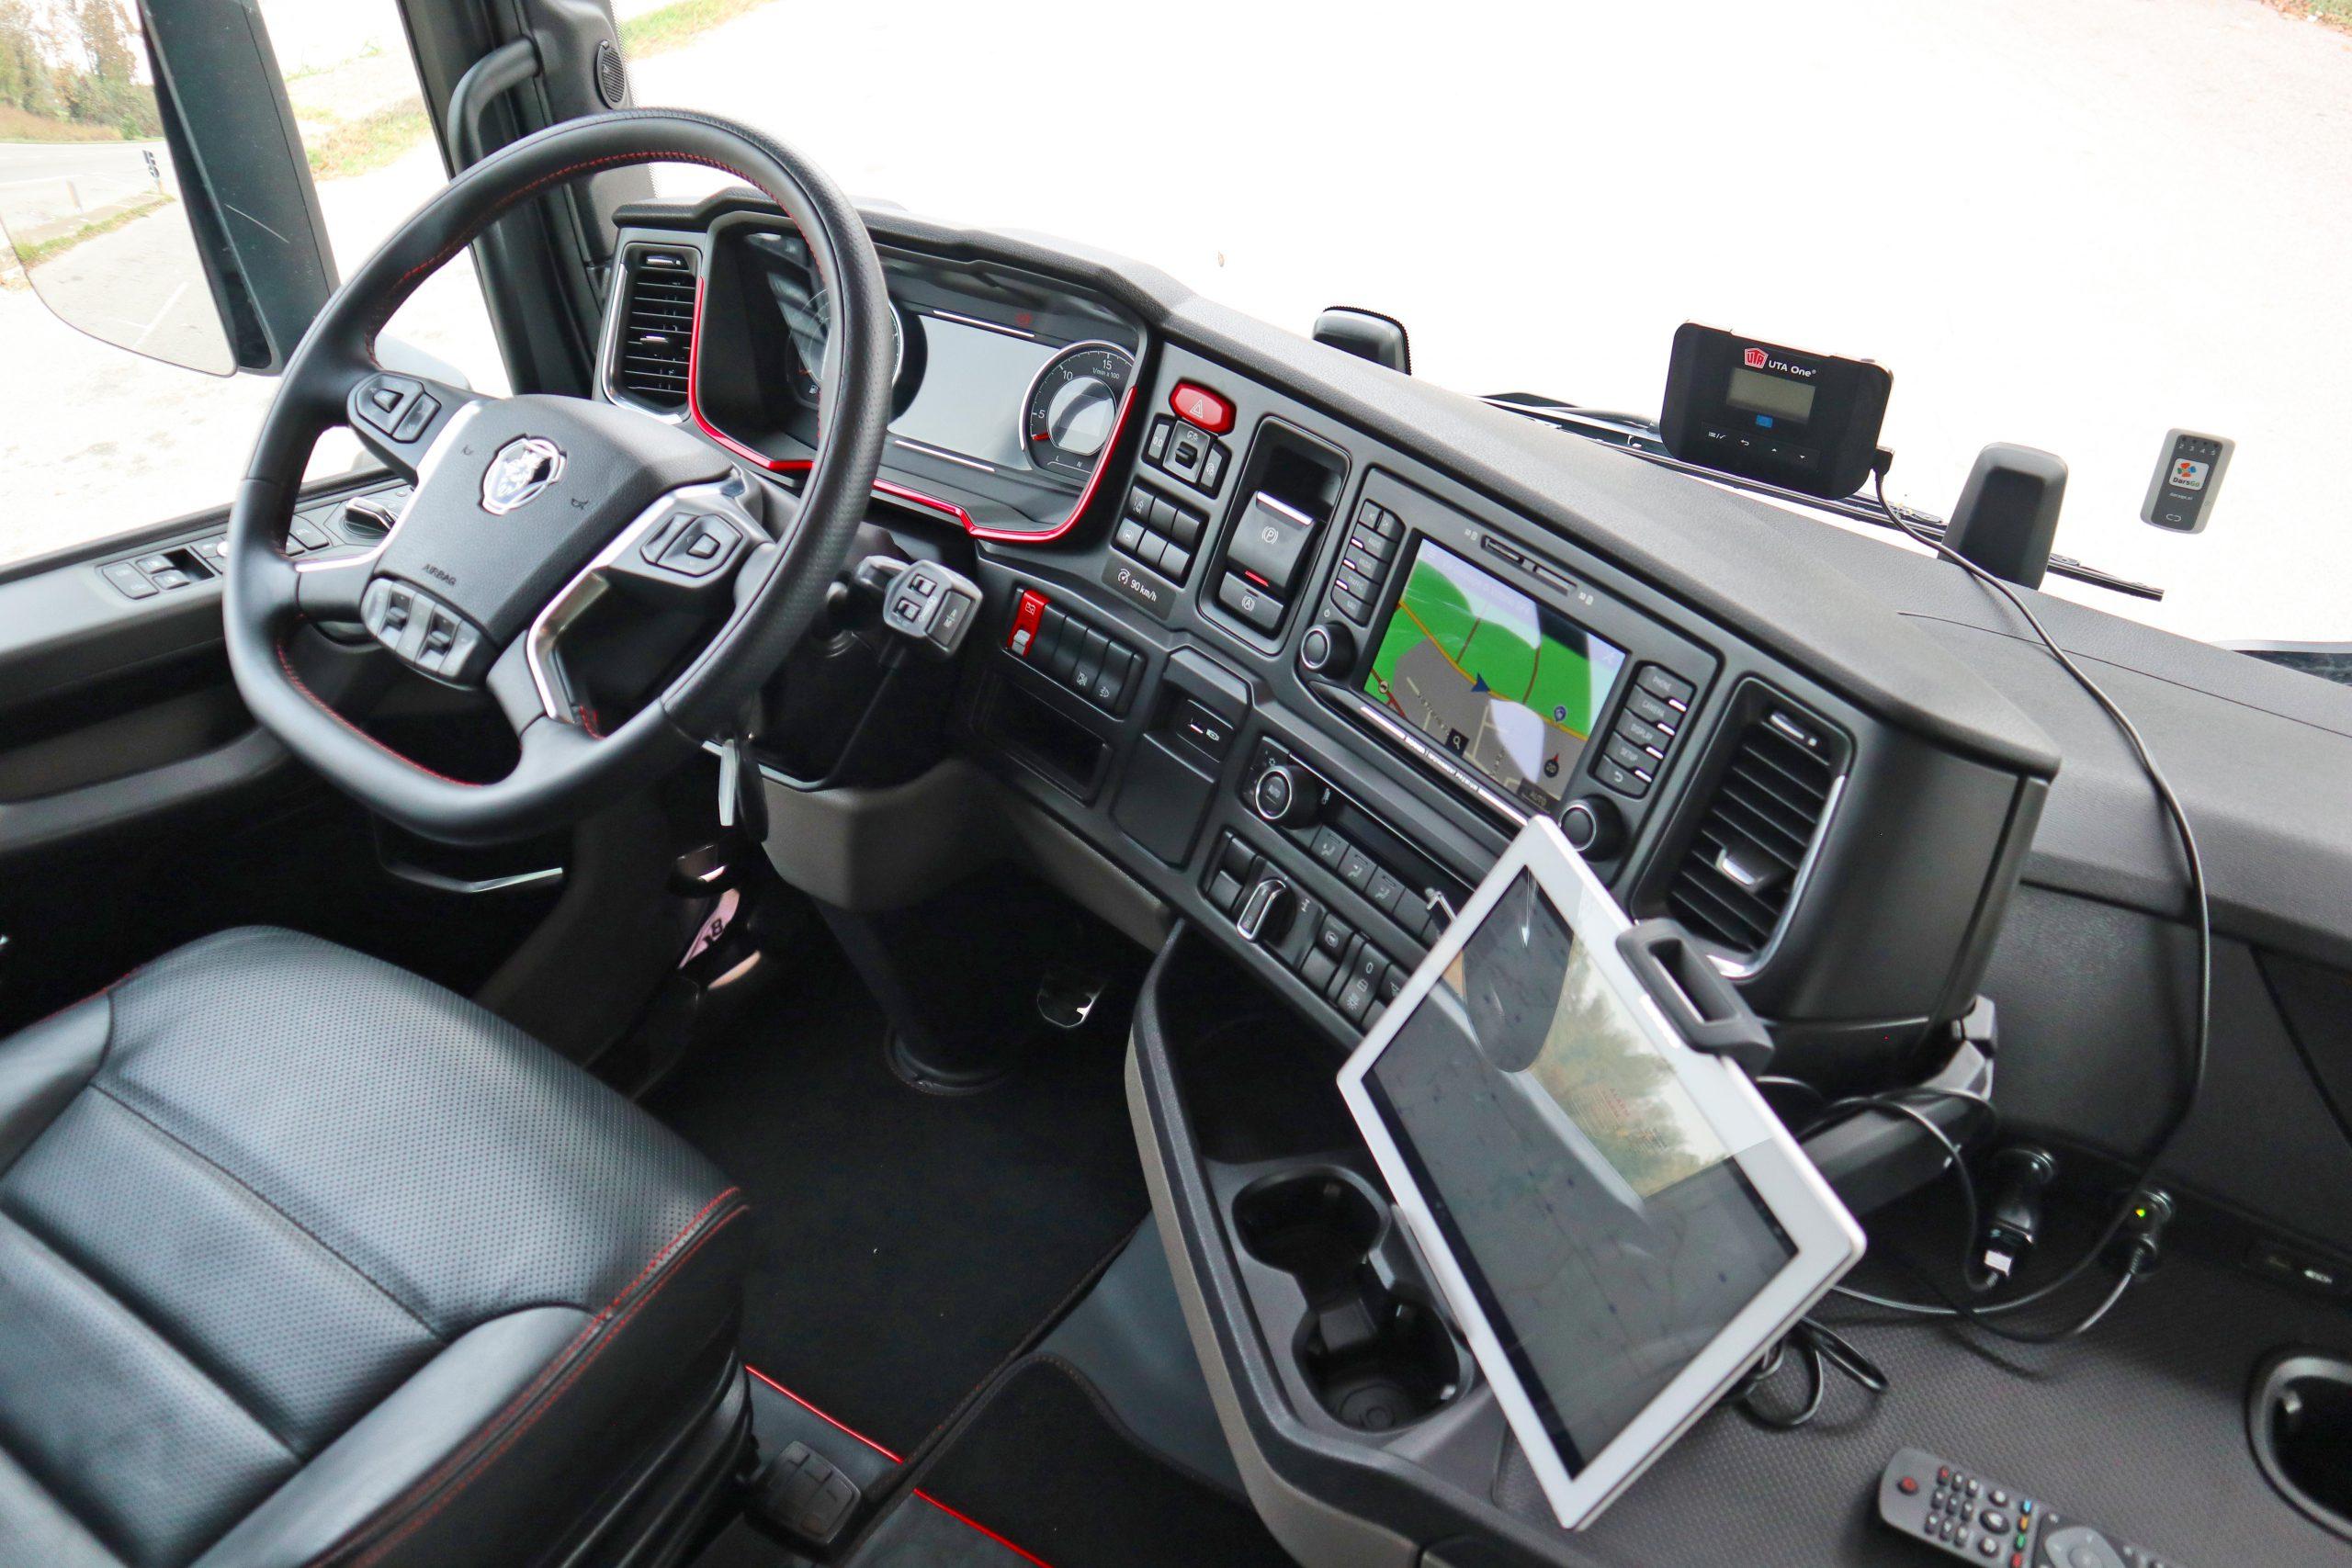 Scania S 650 Next Generation